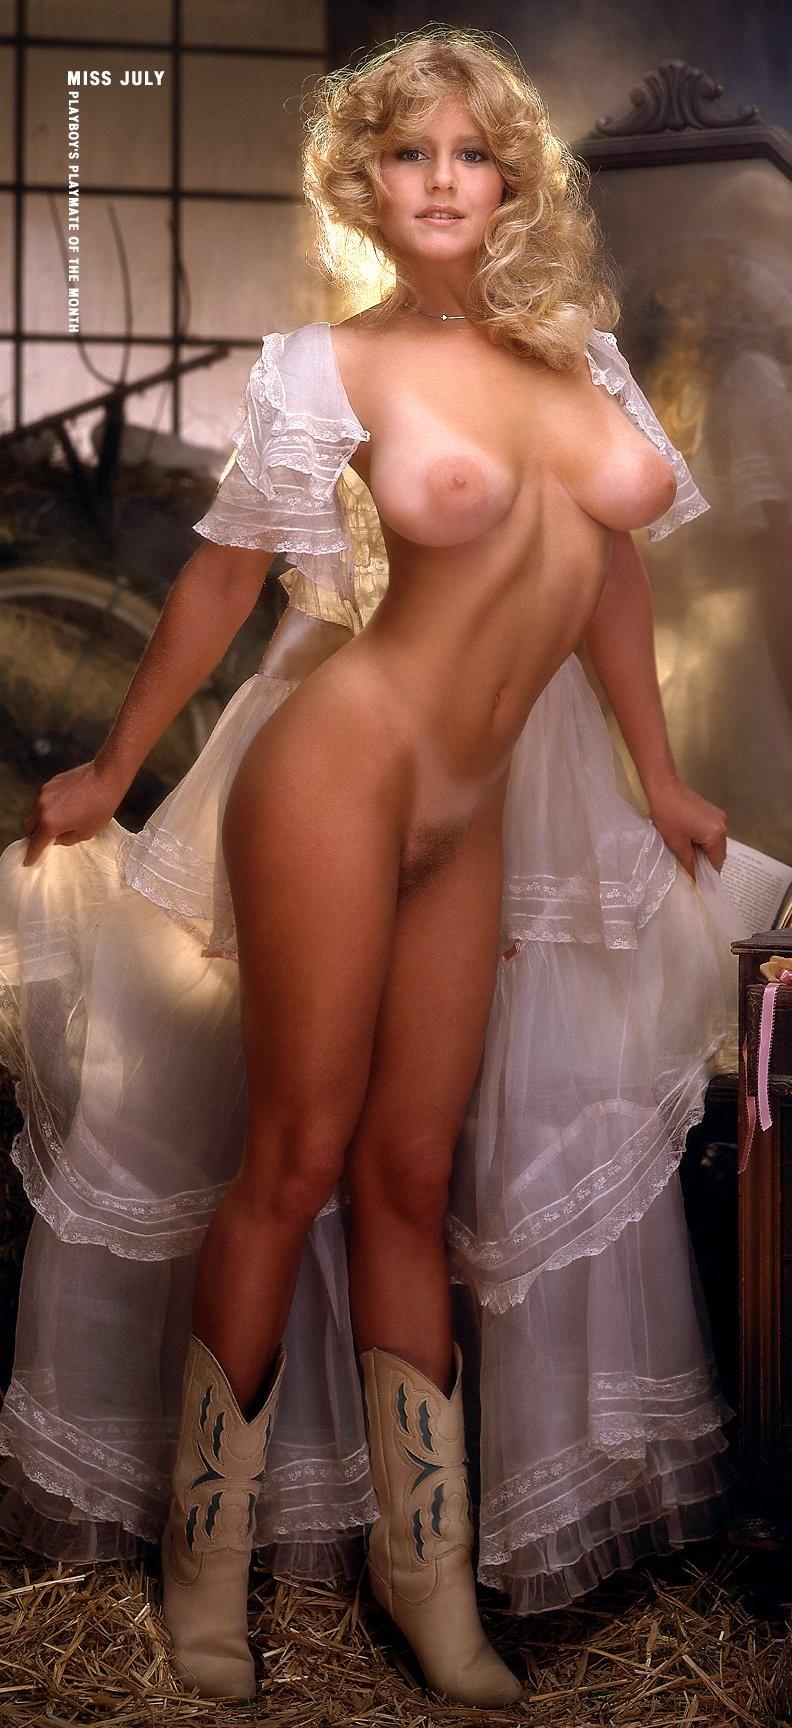 Playmates nude